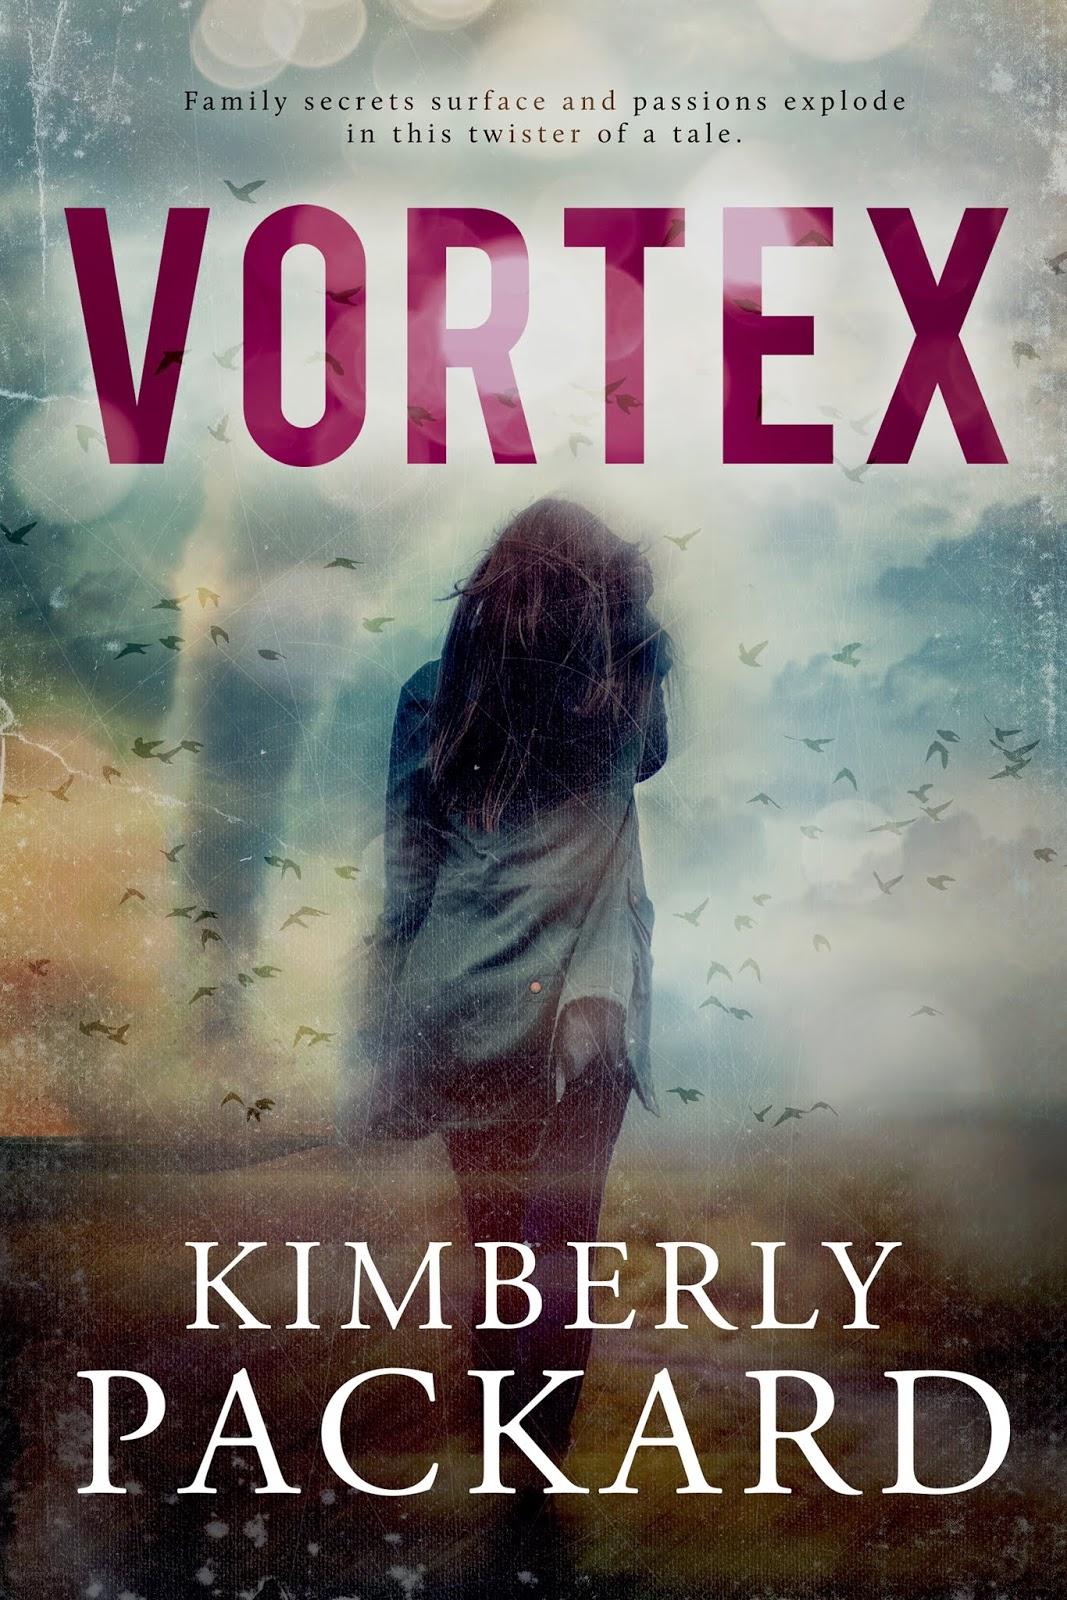 Vortex book cover